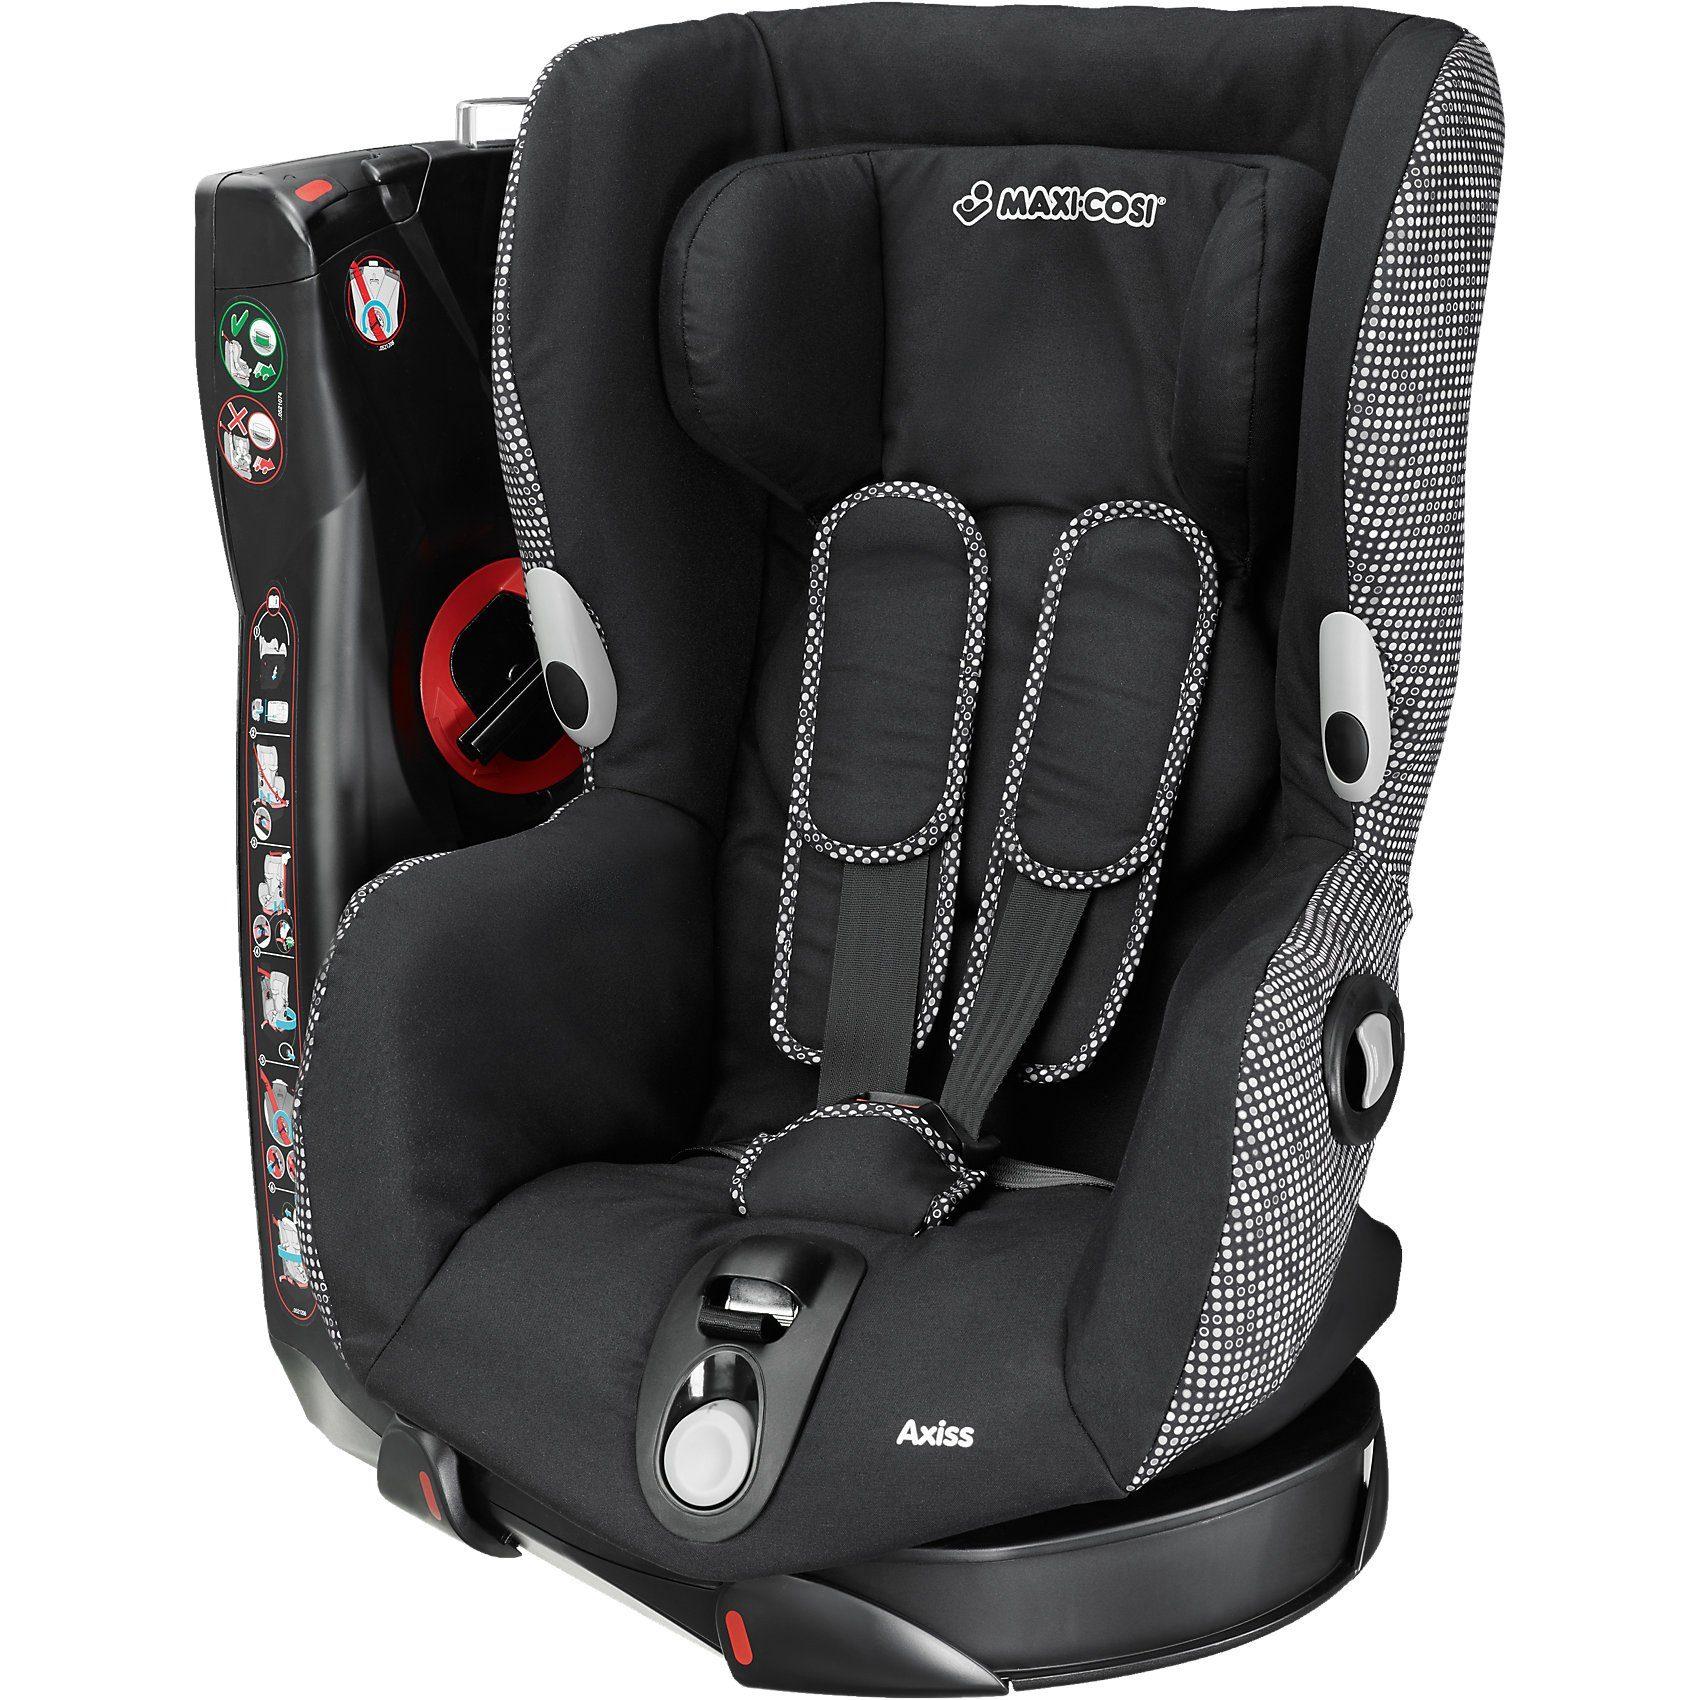 Maxi-Cosi Auto-Kindersitz Axiss, Digital Black, 2015